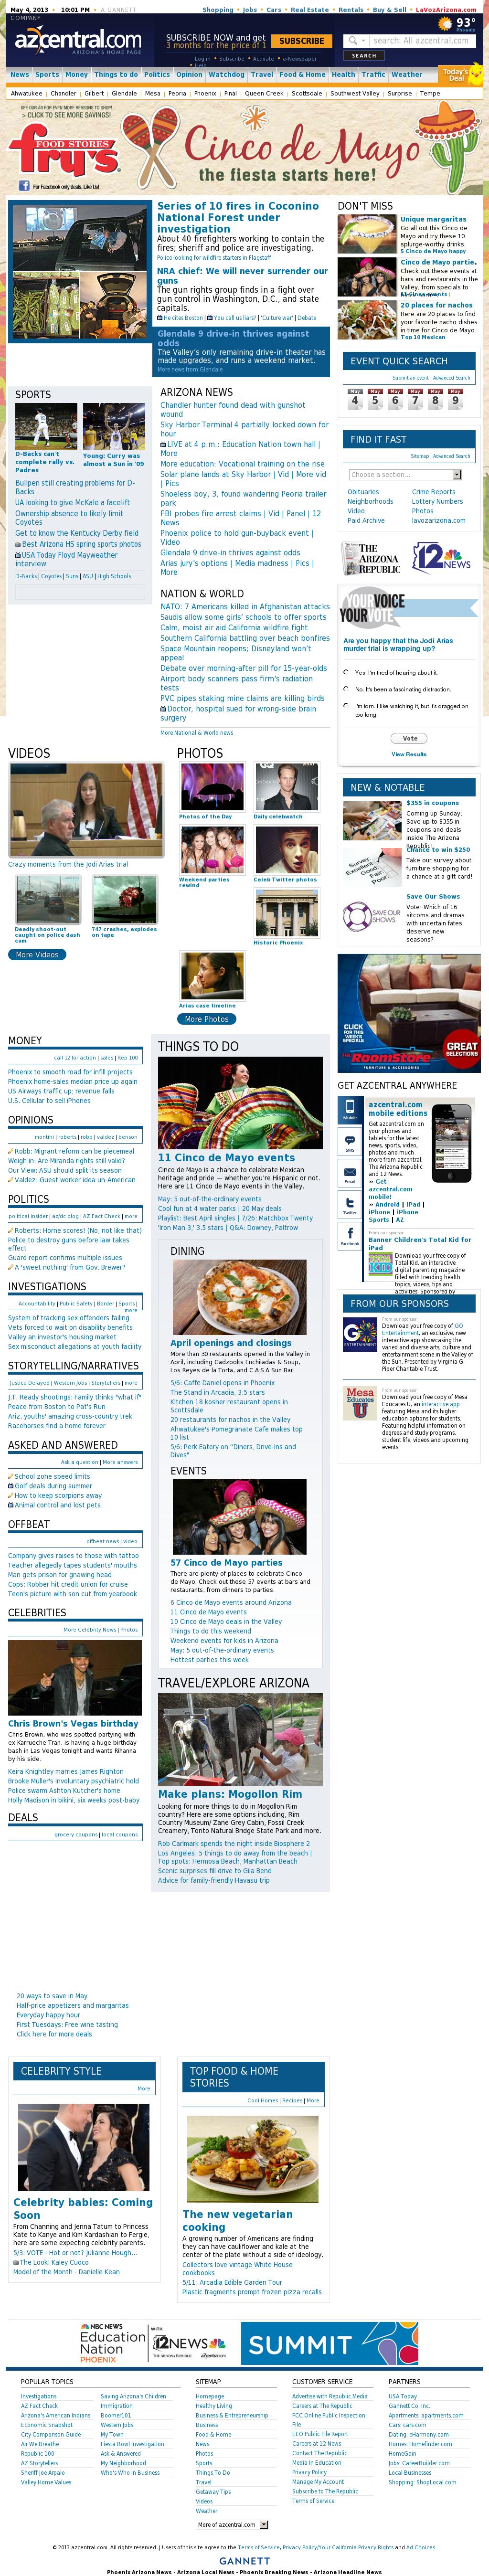 azcentral.com at Saturday May 4, 2013, 10:01 p.m. UTC